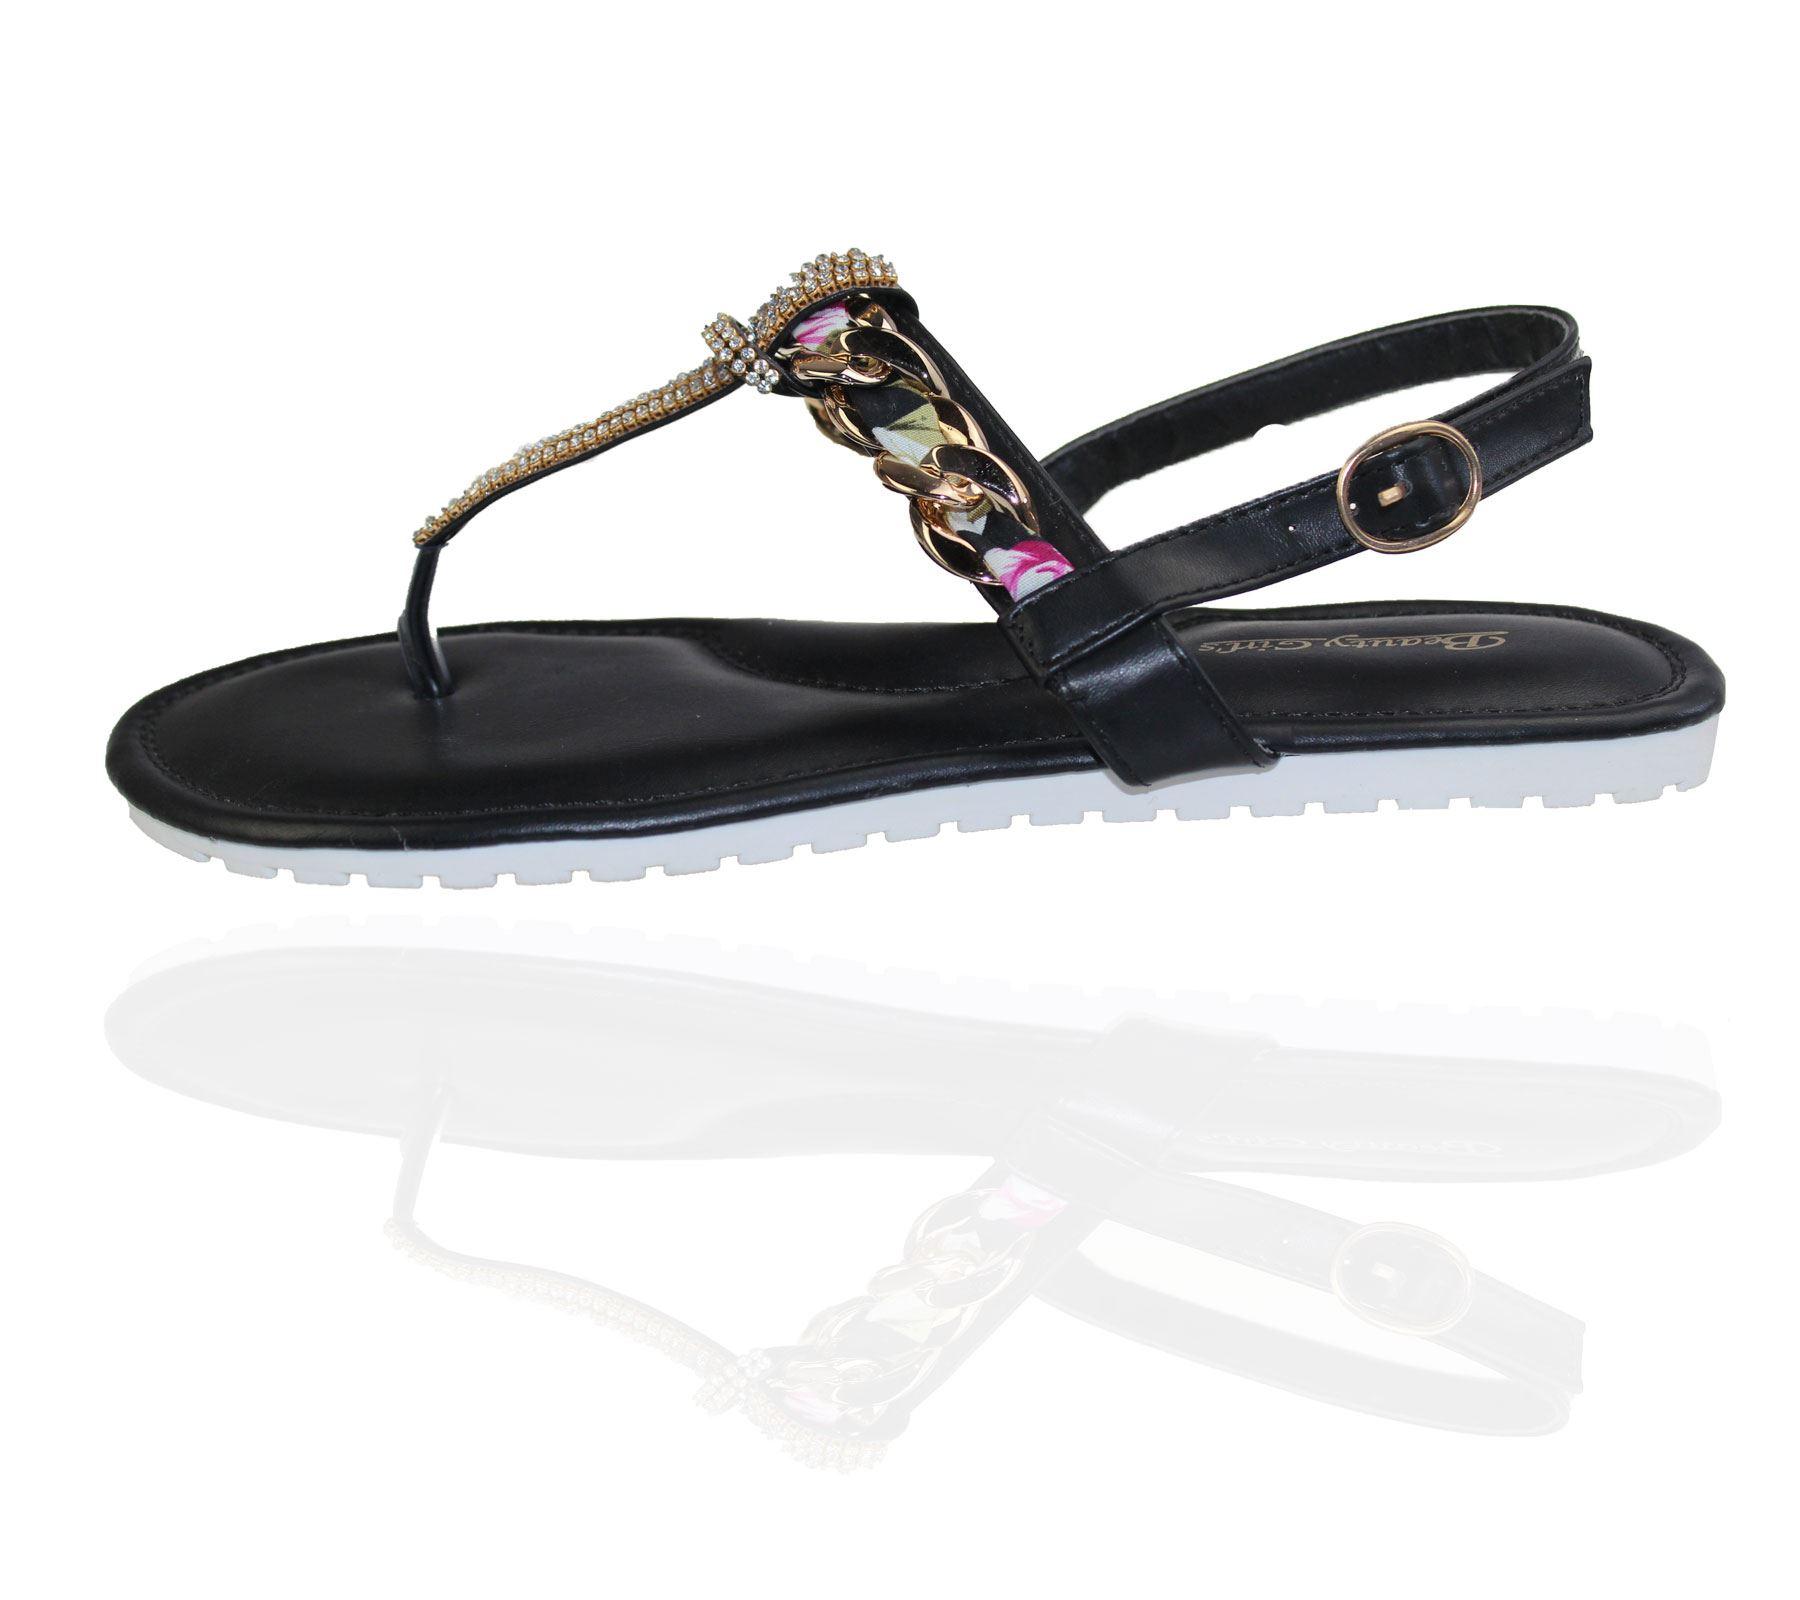 KOLLACHE-Womens-Buckle-Flat-Summer-Caual-Diamonte-Ladies-Evening-Party-Sandals thumbnail 4